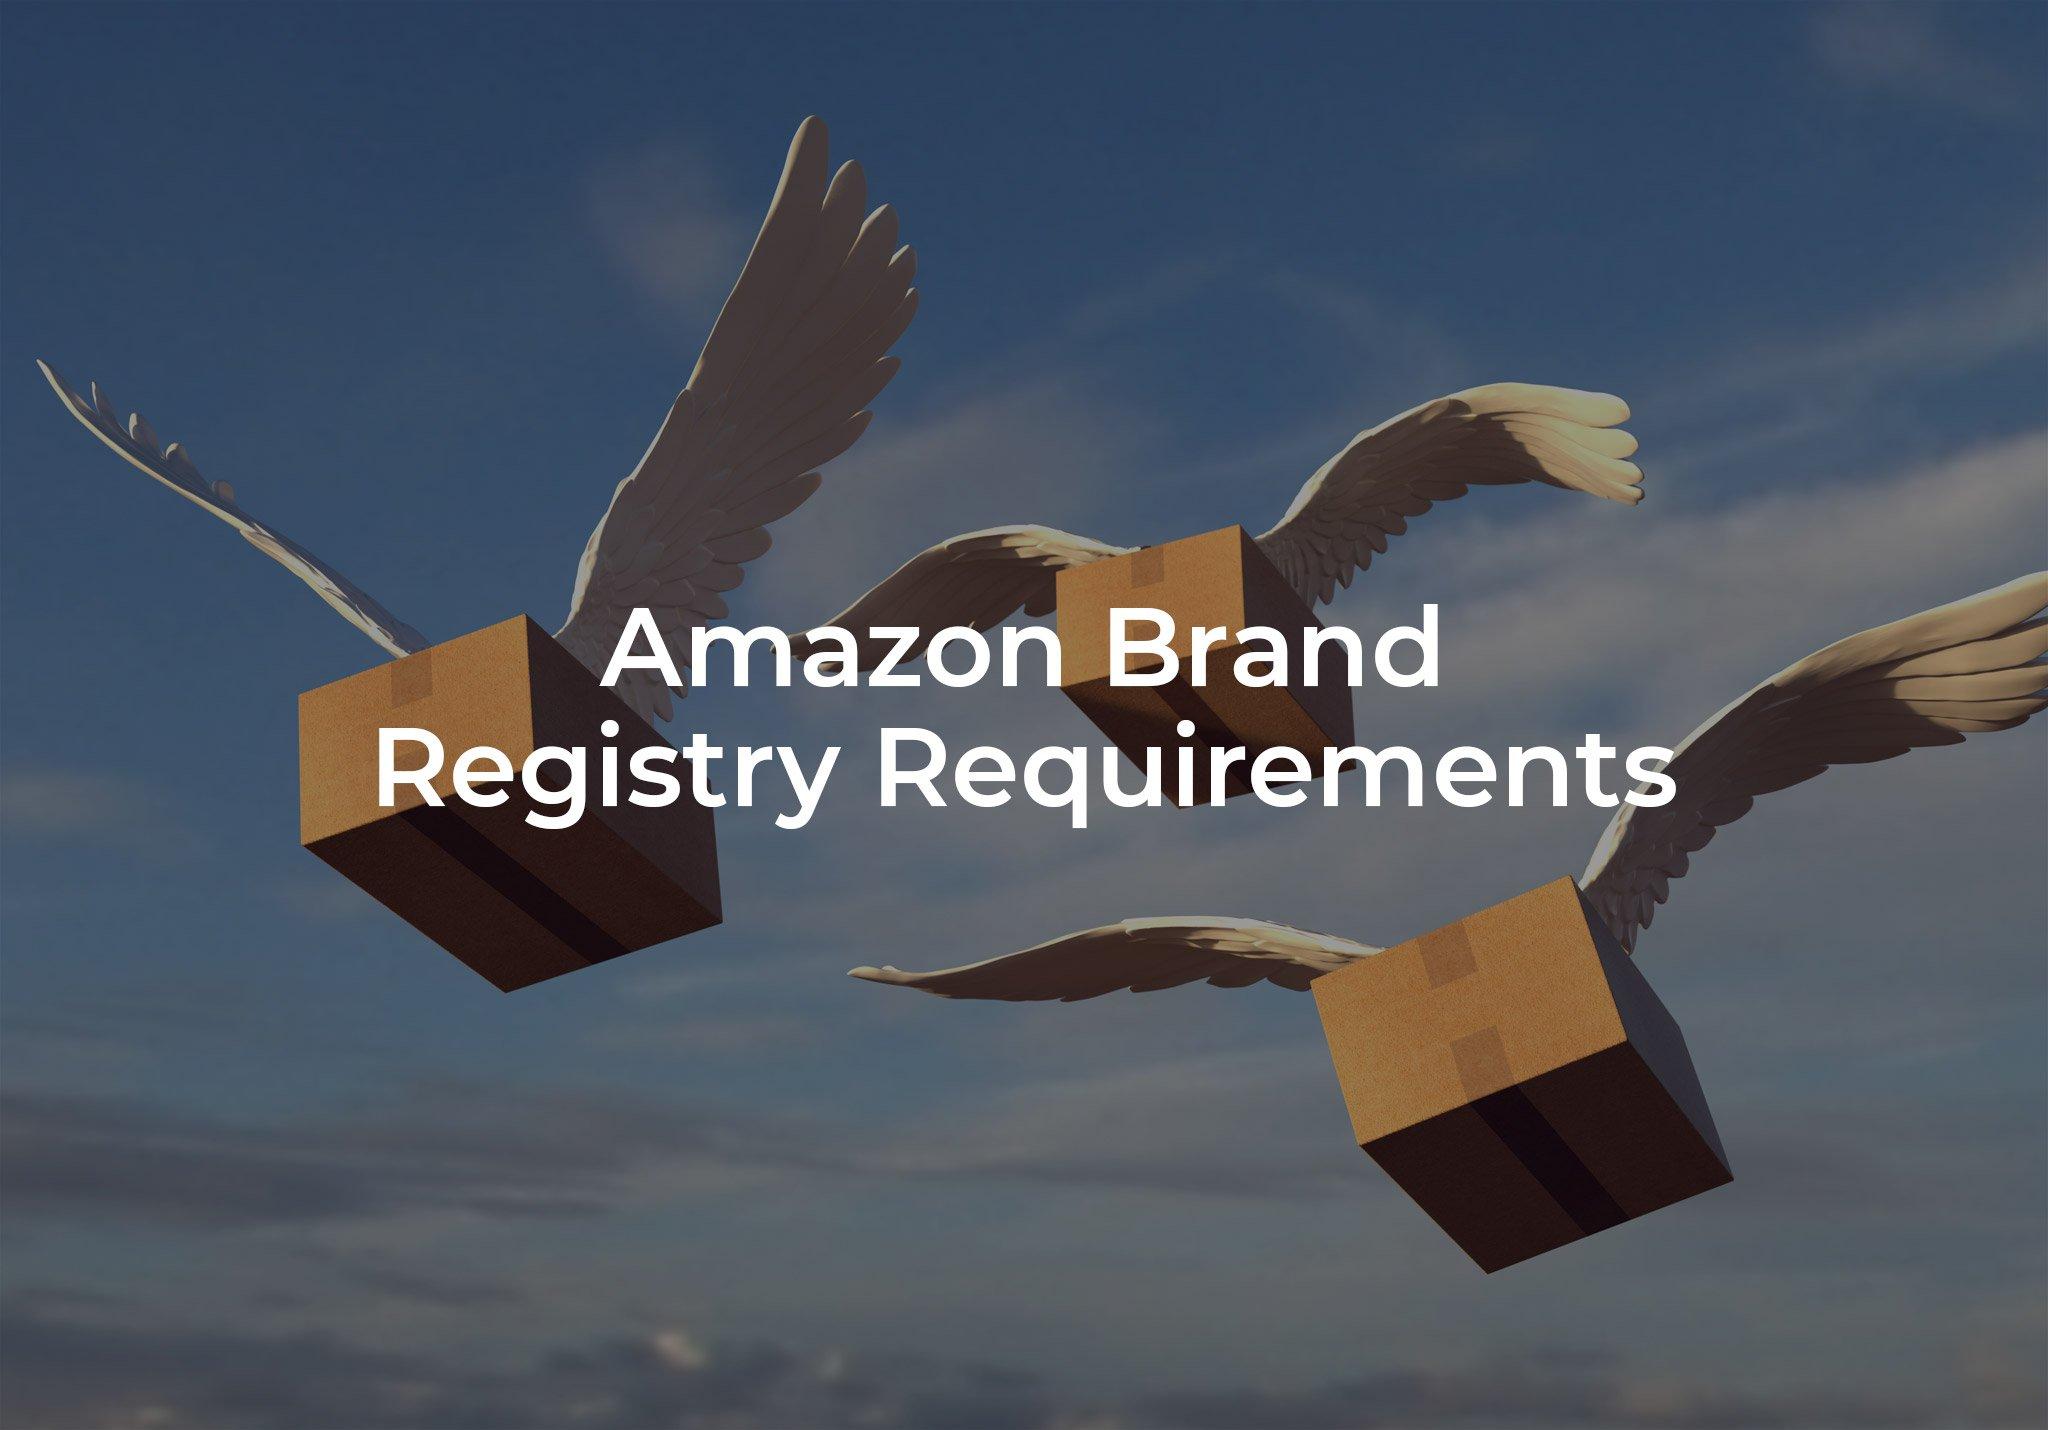 Amazon Brand Registry Requirements